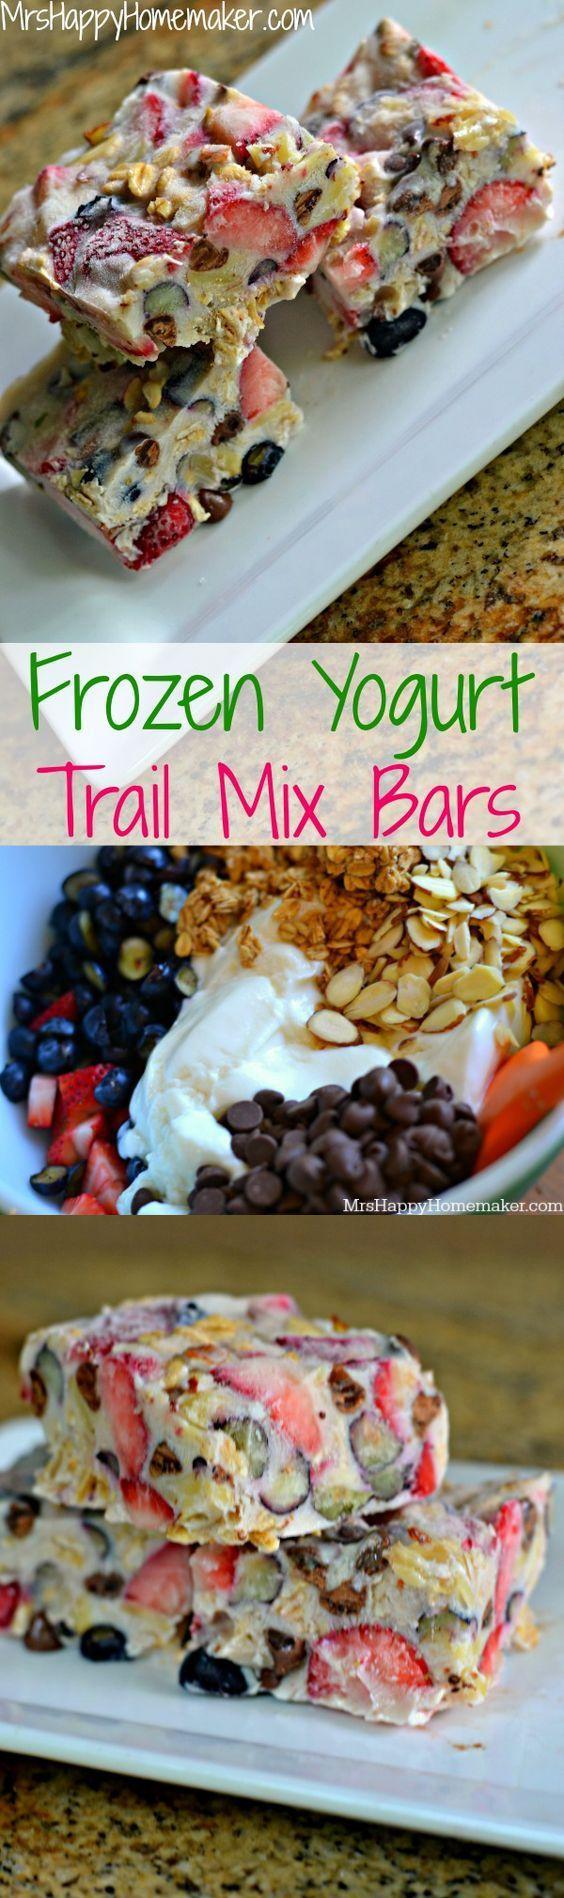 Frozen Yogurt Trail Mix Bars Healthy Recipes | Dish